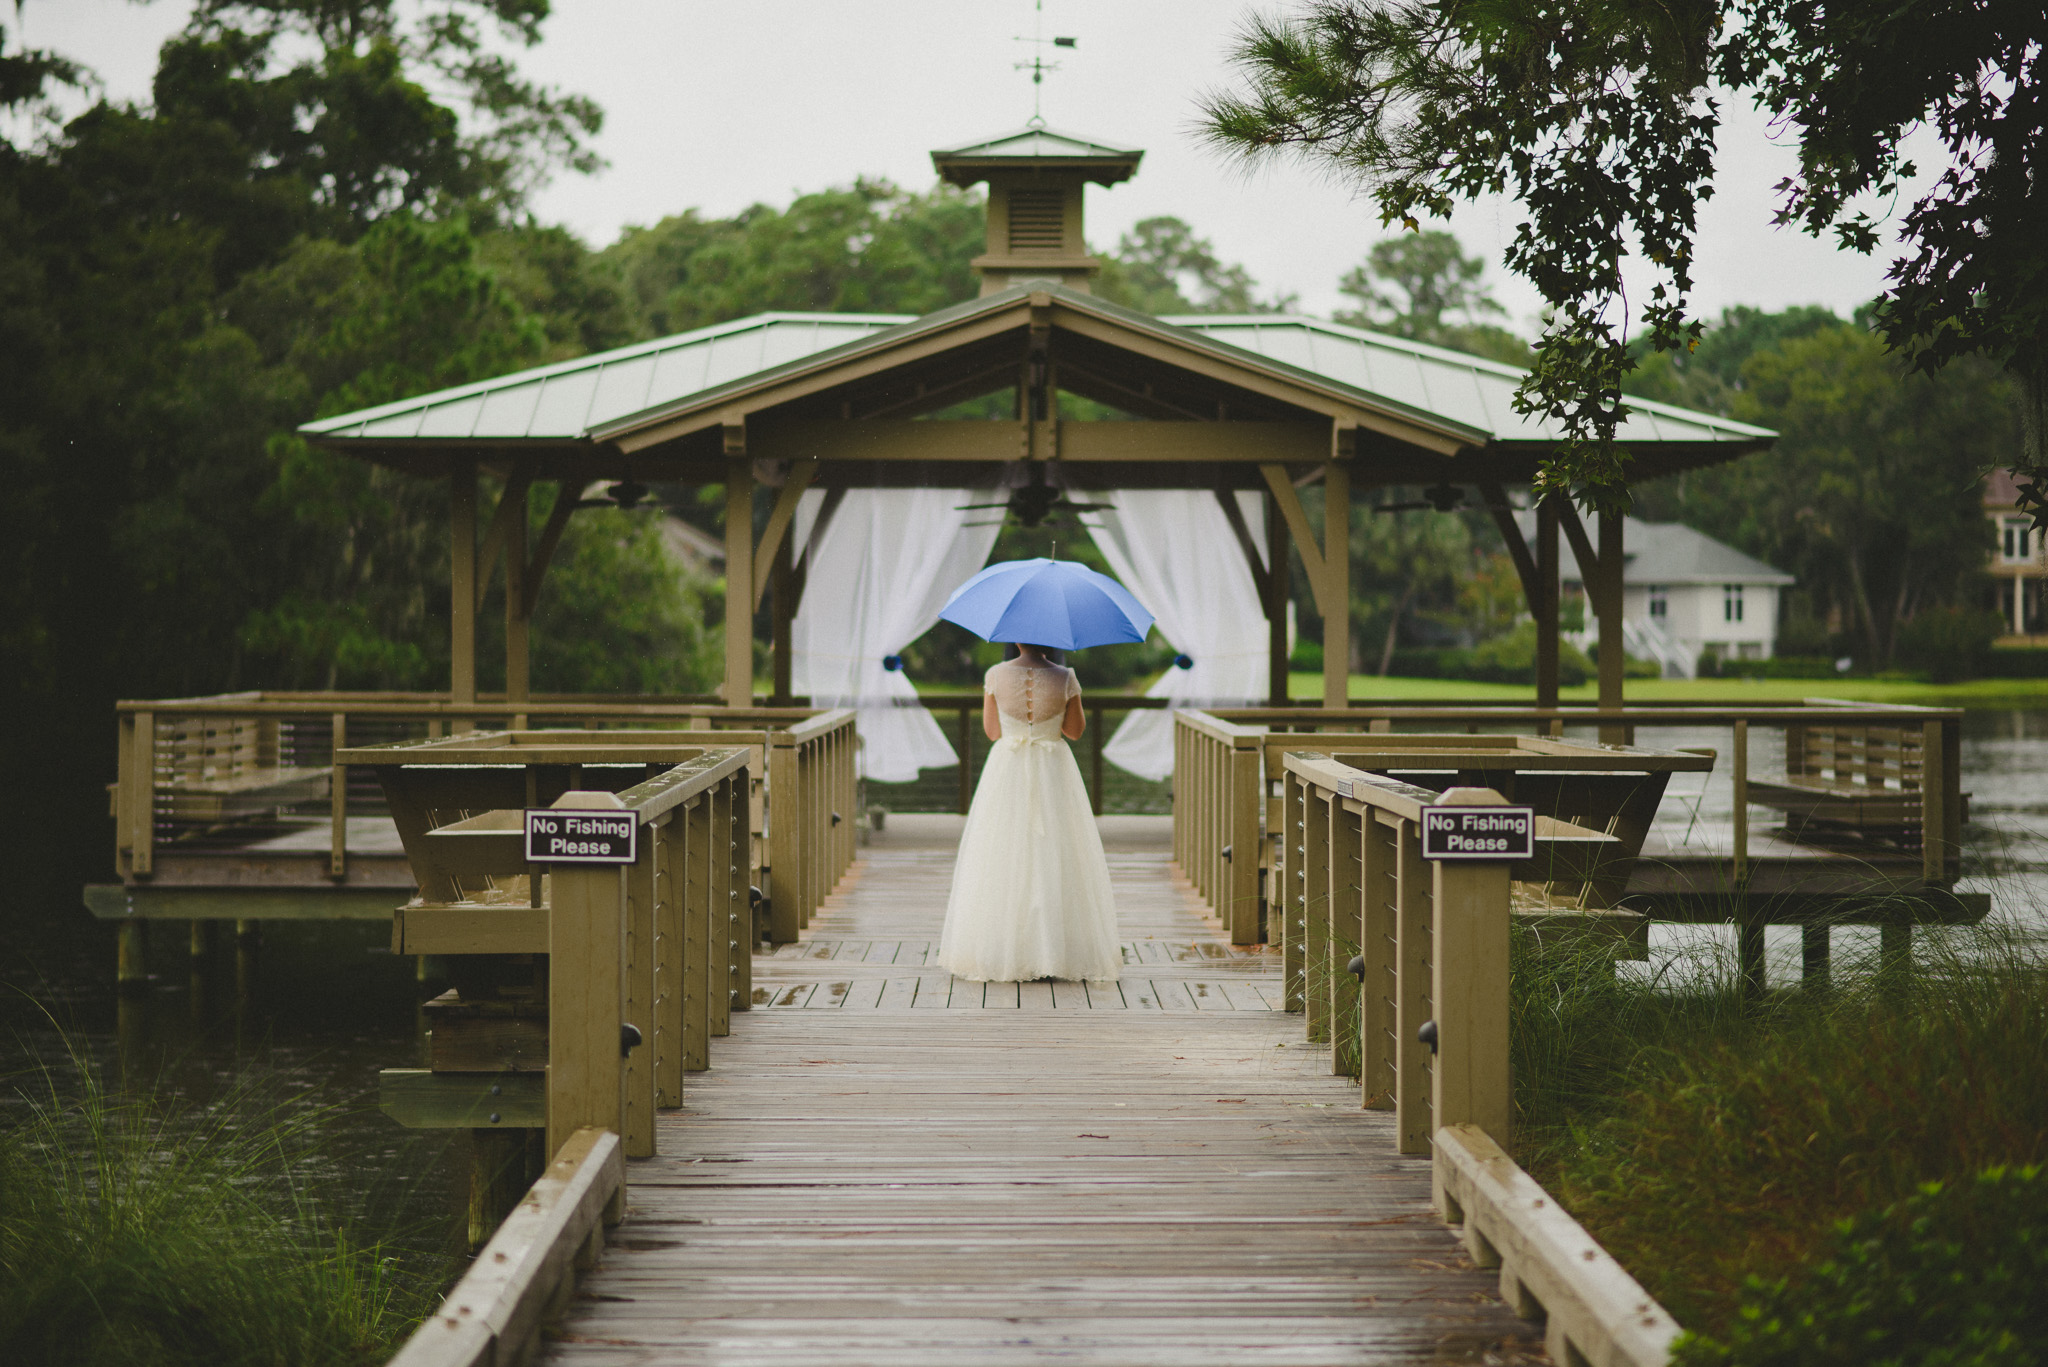 Hilton Head Wedding Photographer - Bride in rain with umbrella